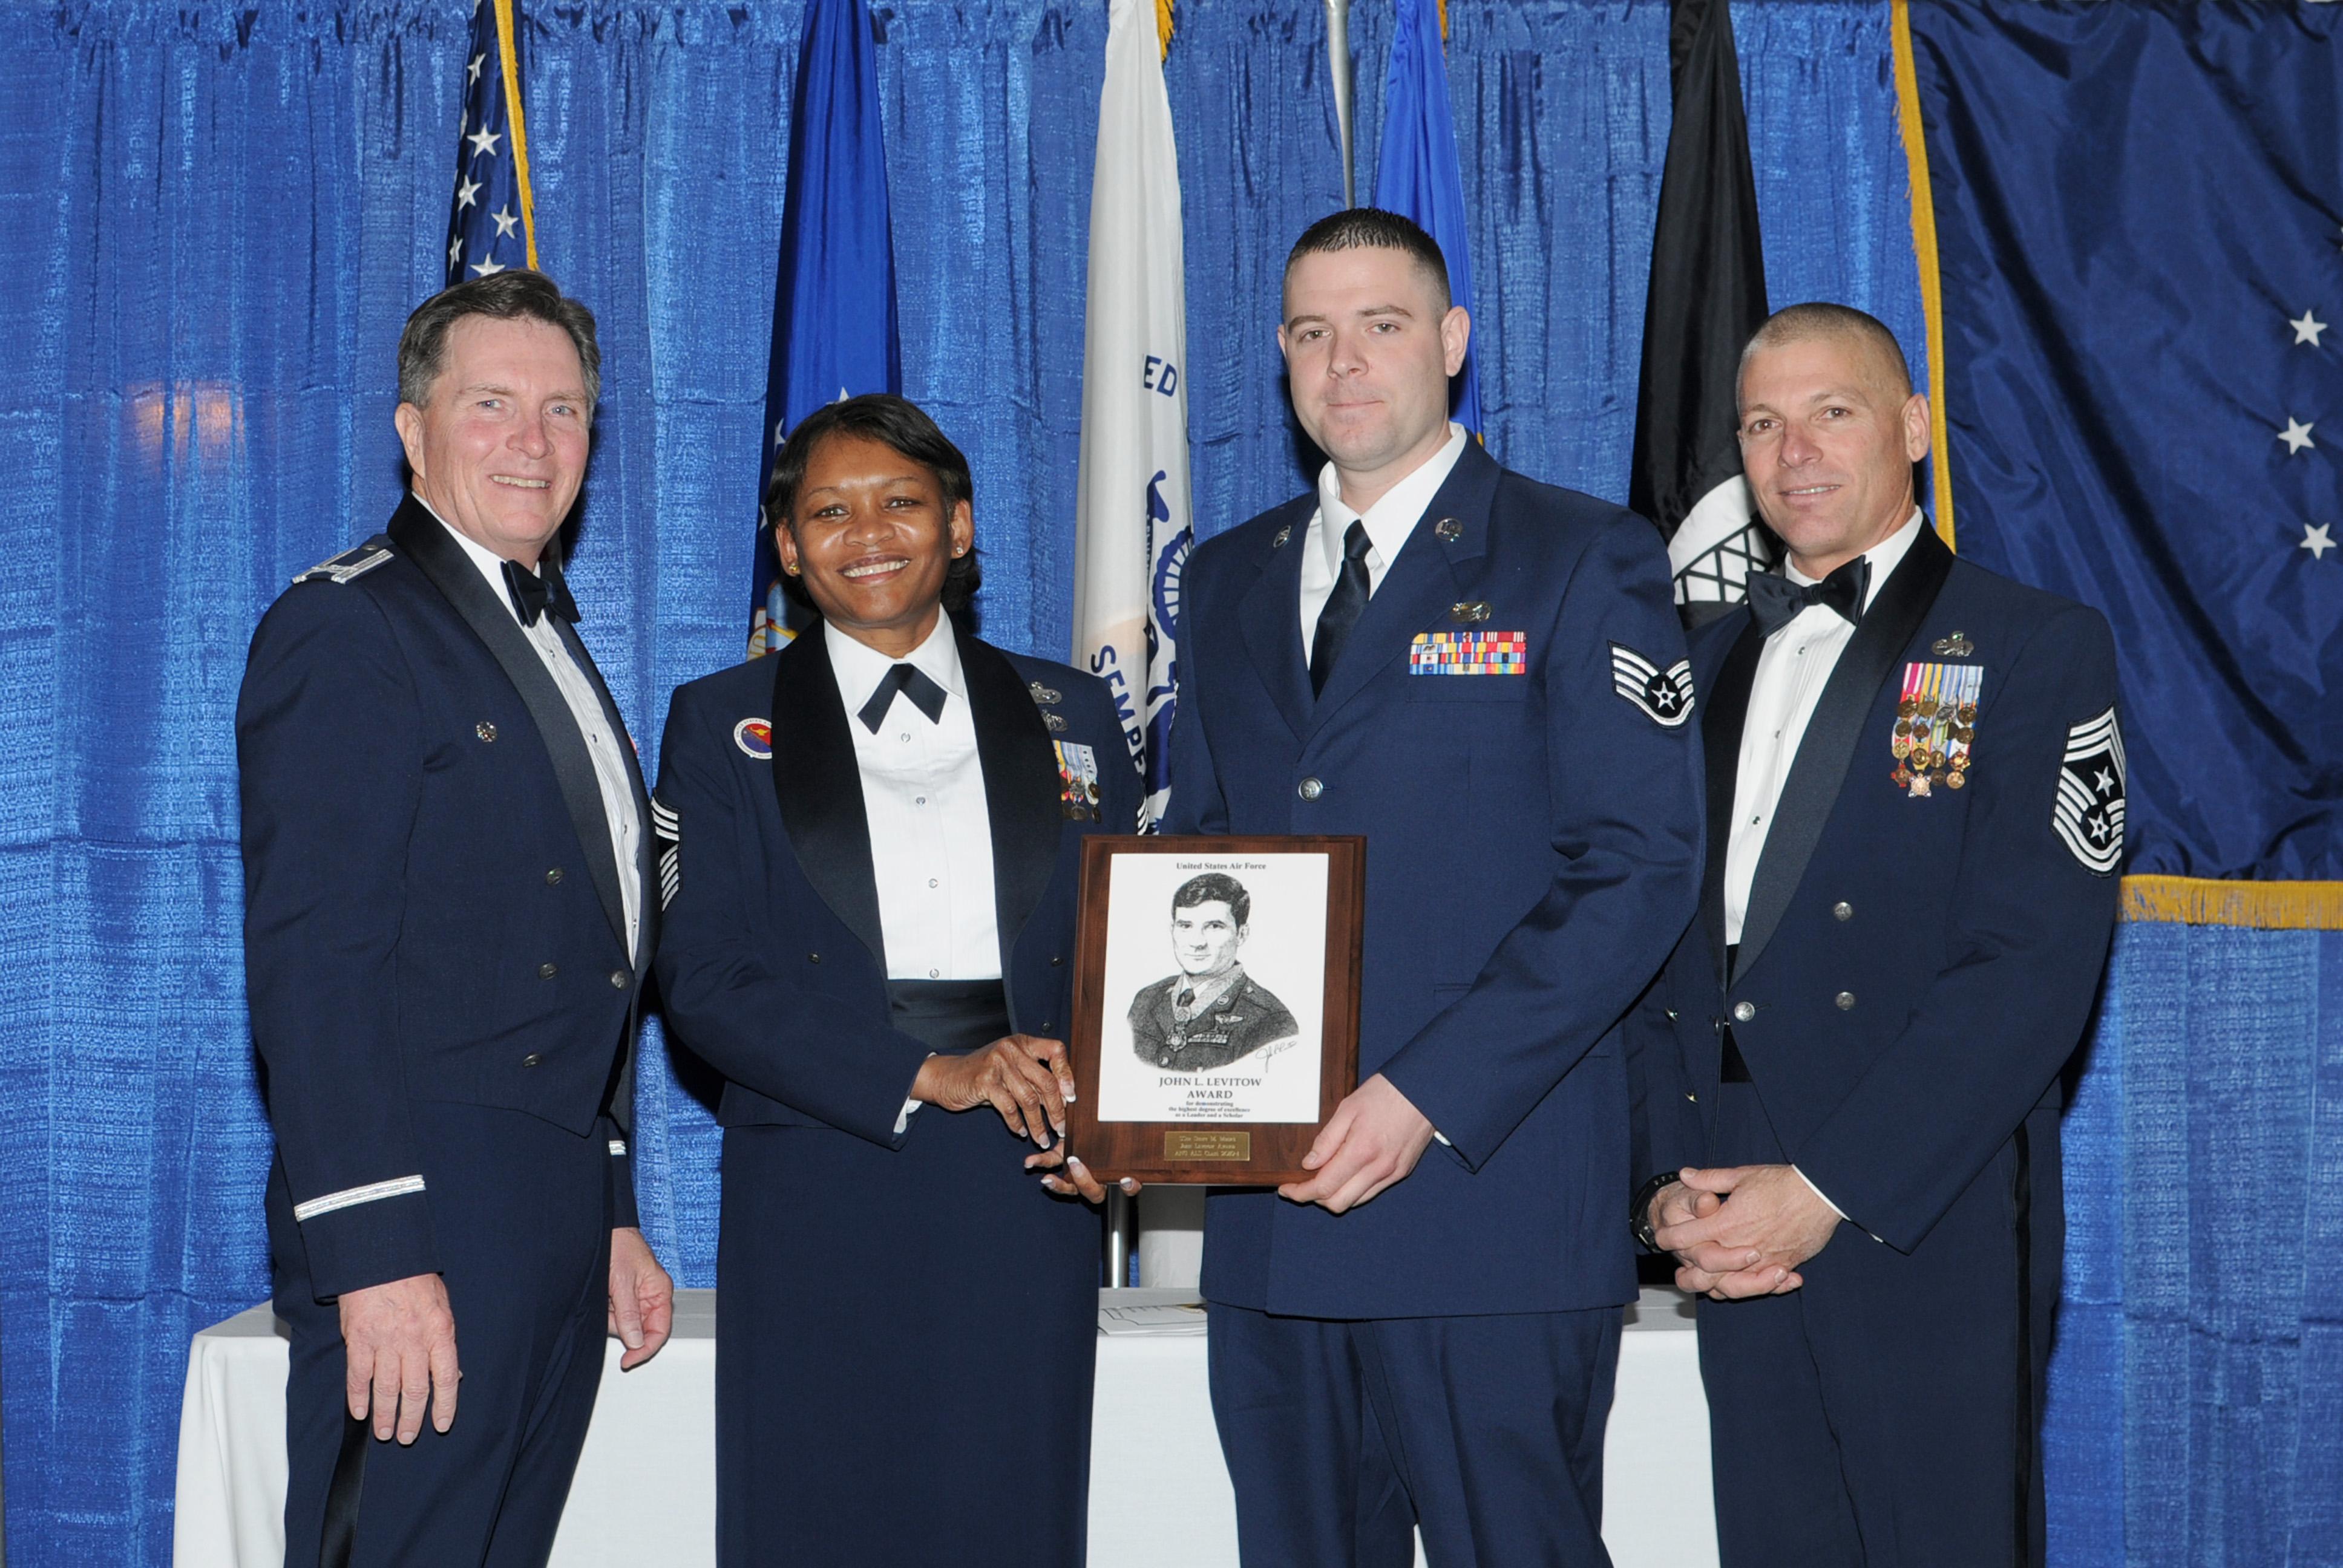 Iowa Guardsman Is Top Graduate At Airman Leadership School 132d